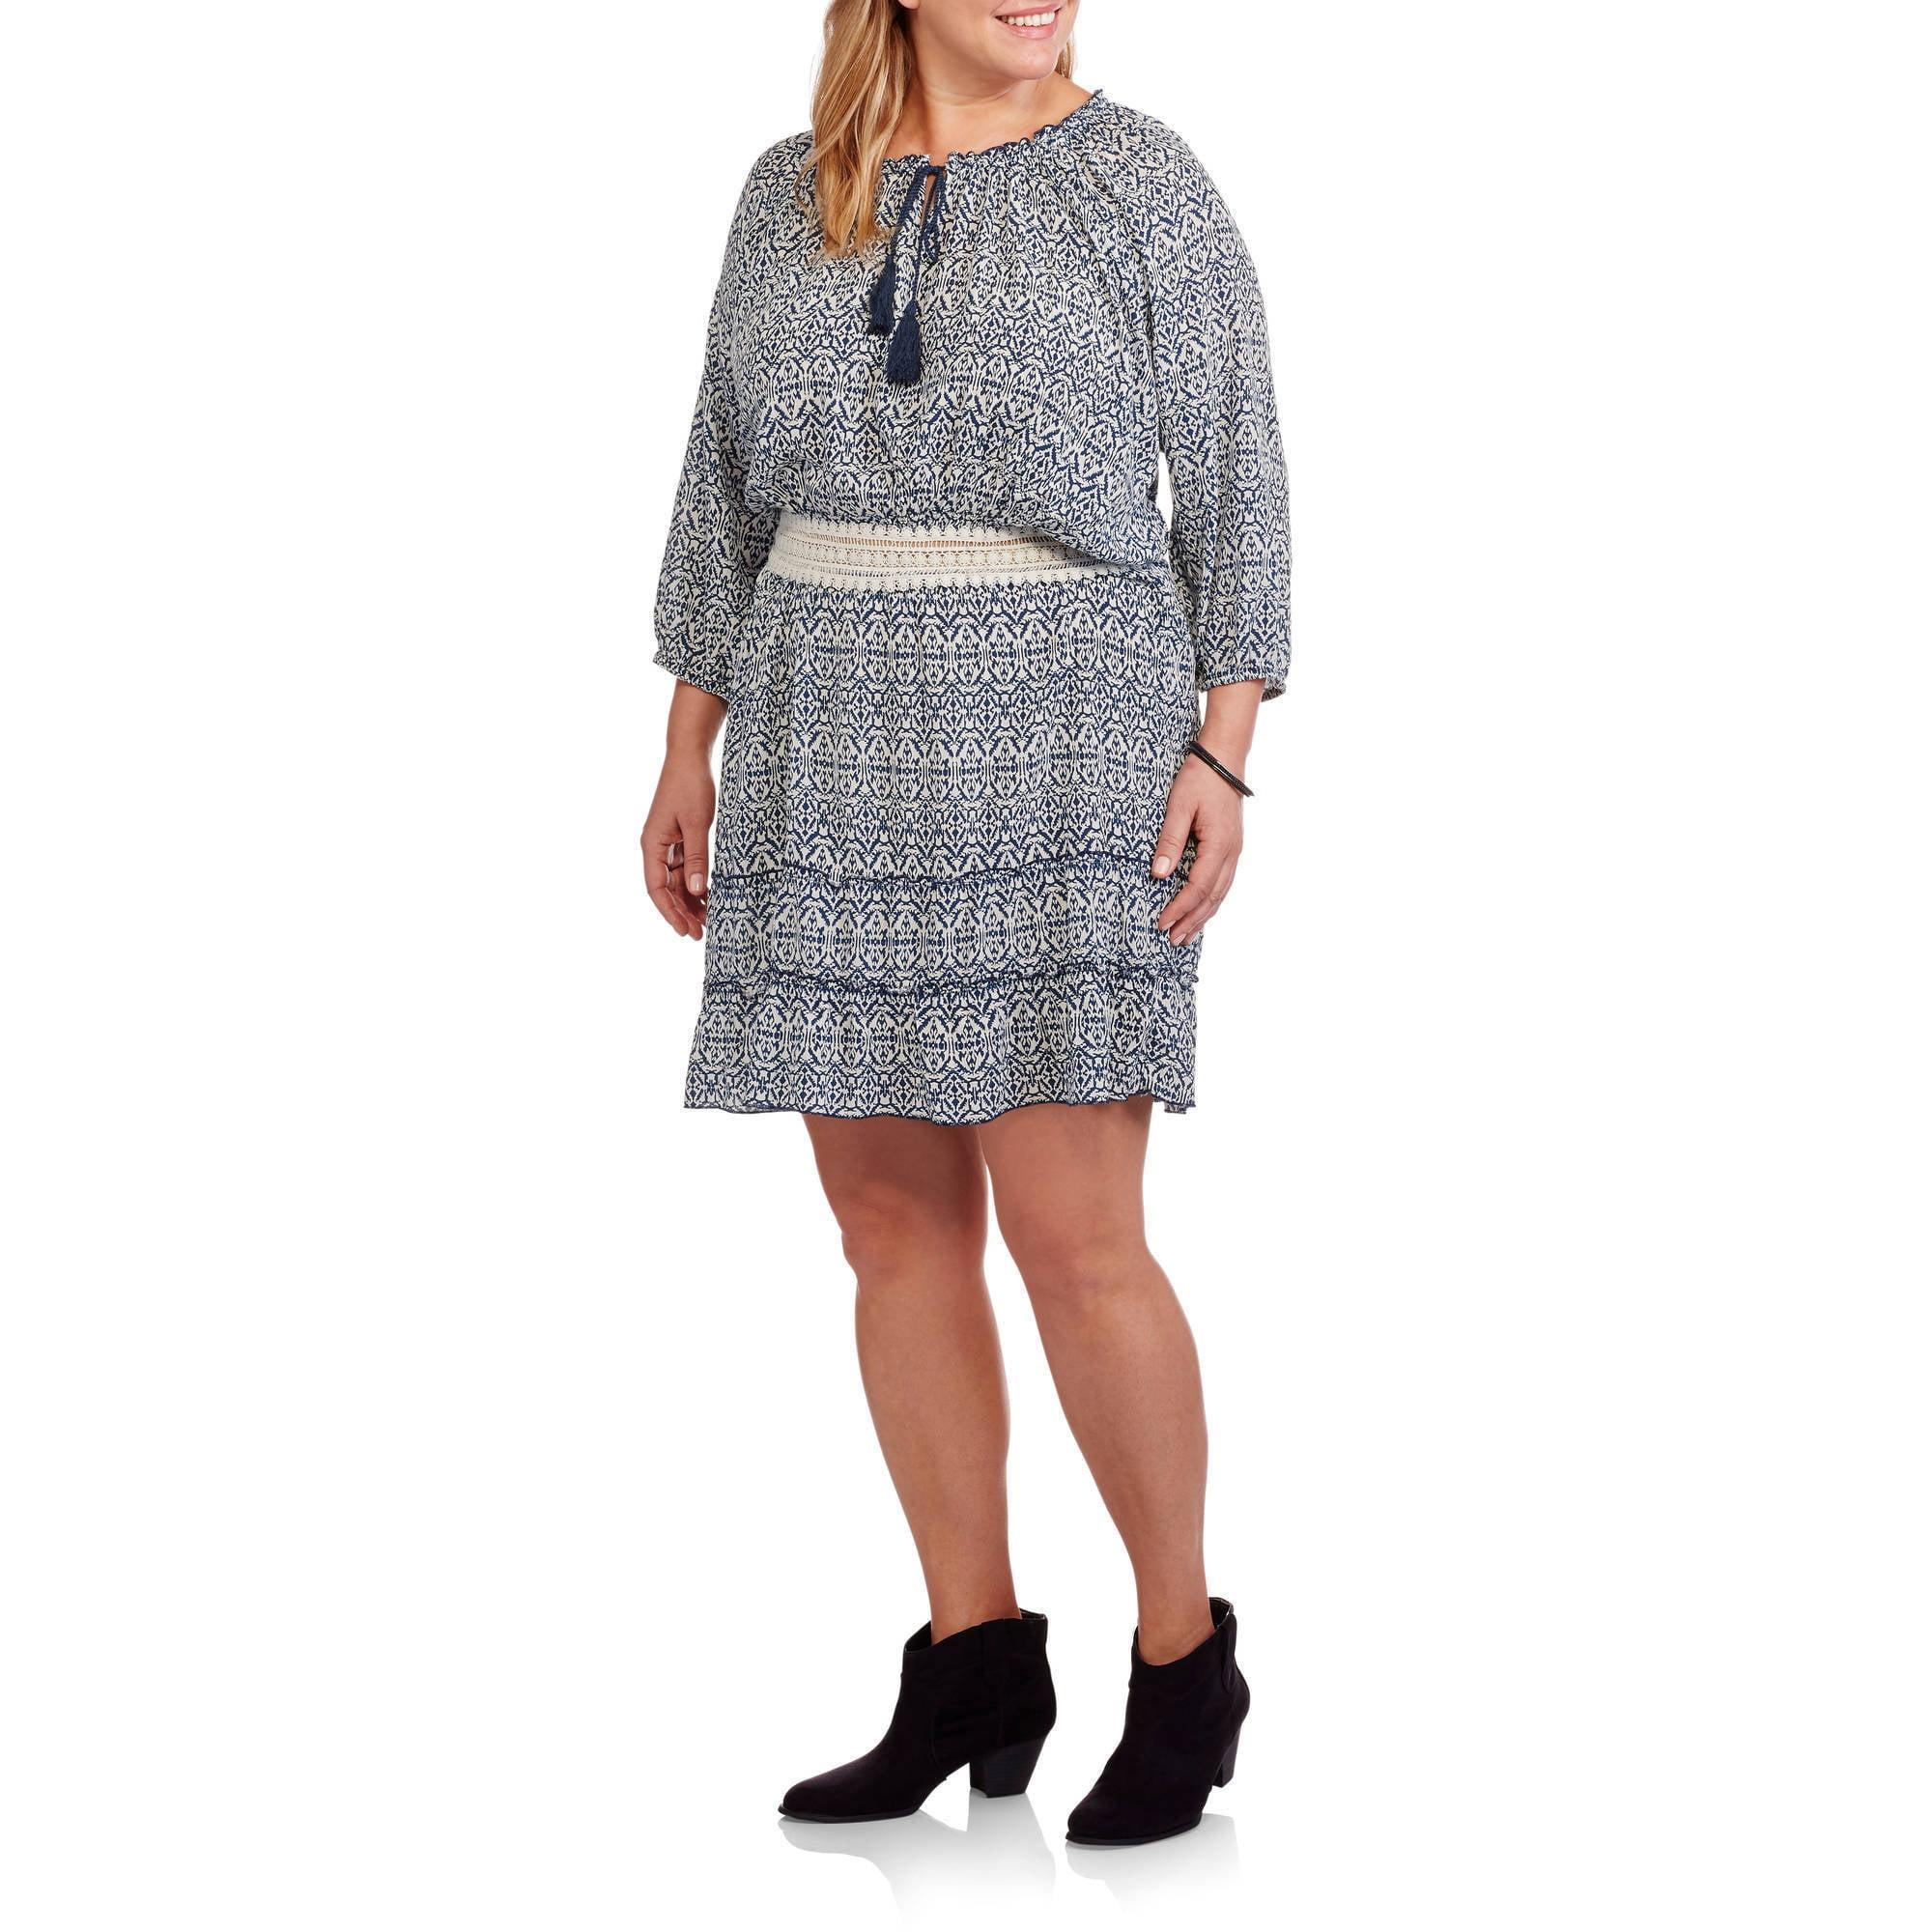 Derek Heart Women's Plus Peasant Dress with Tassel